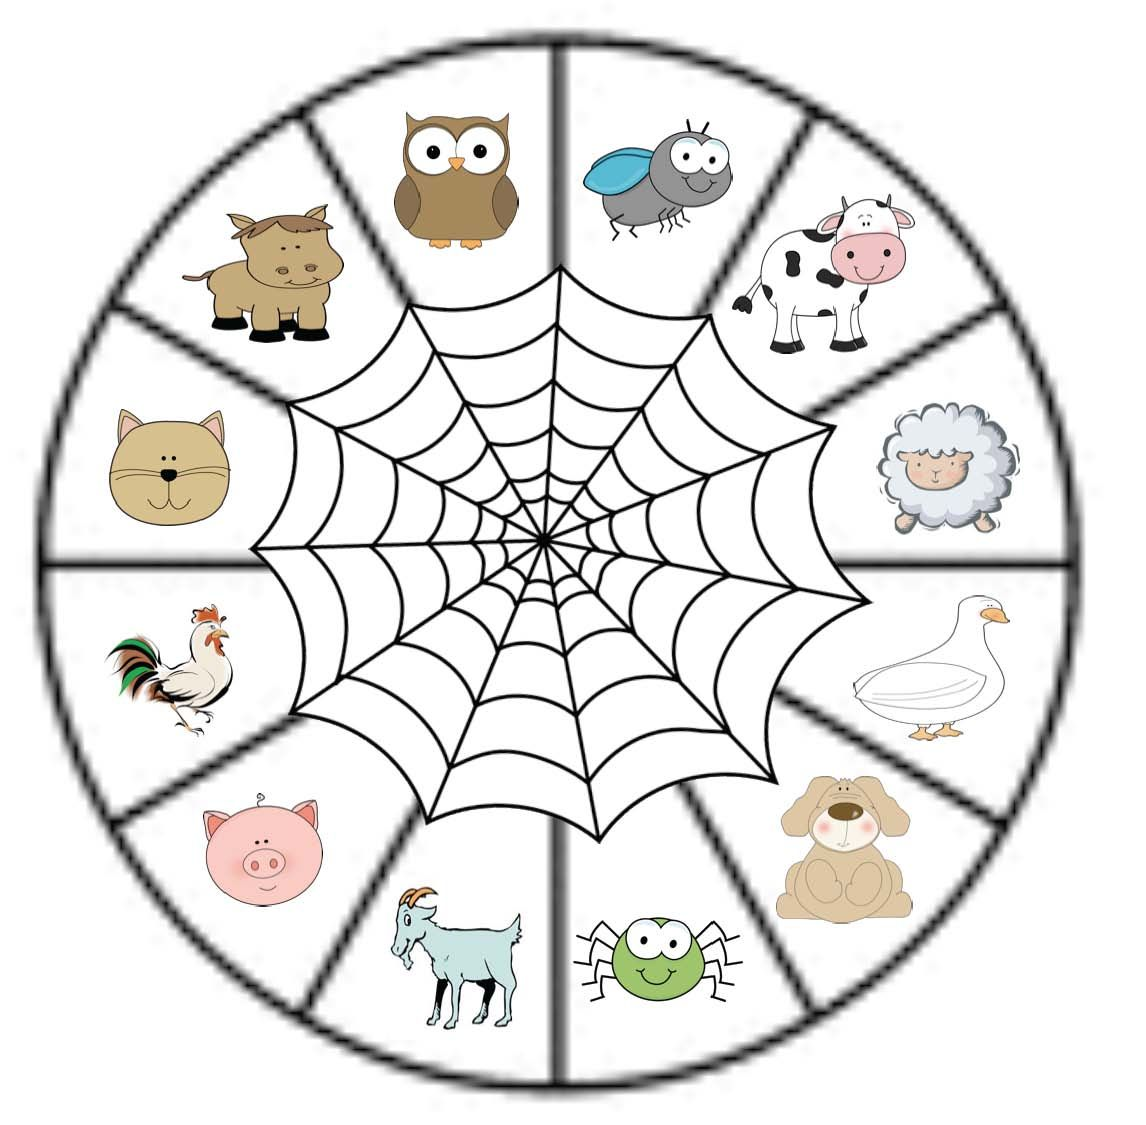 Spider Activities And Crafts